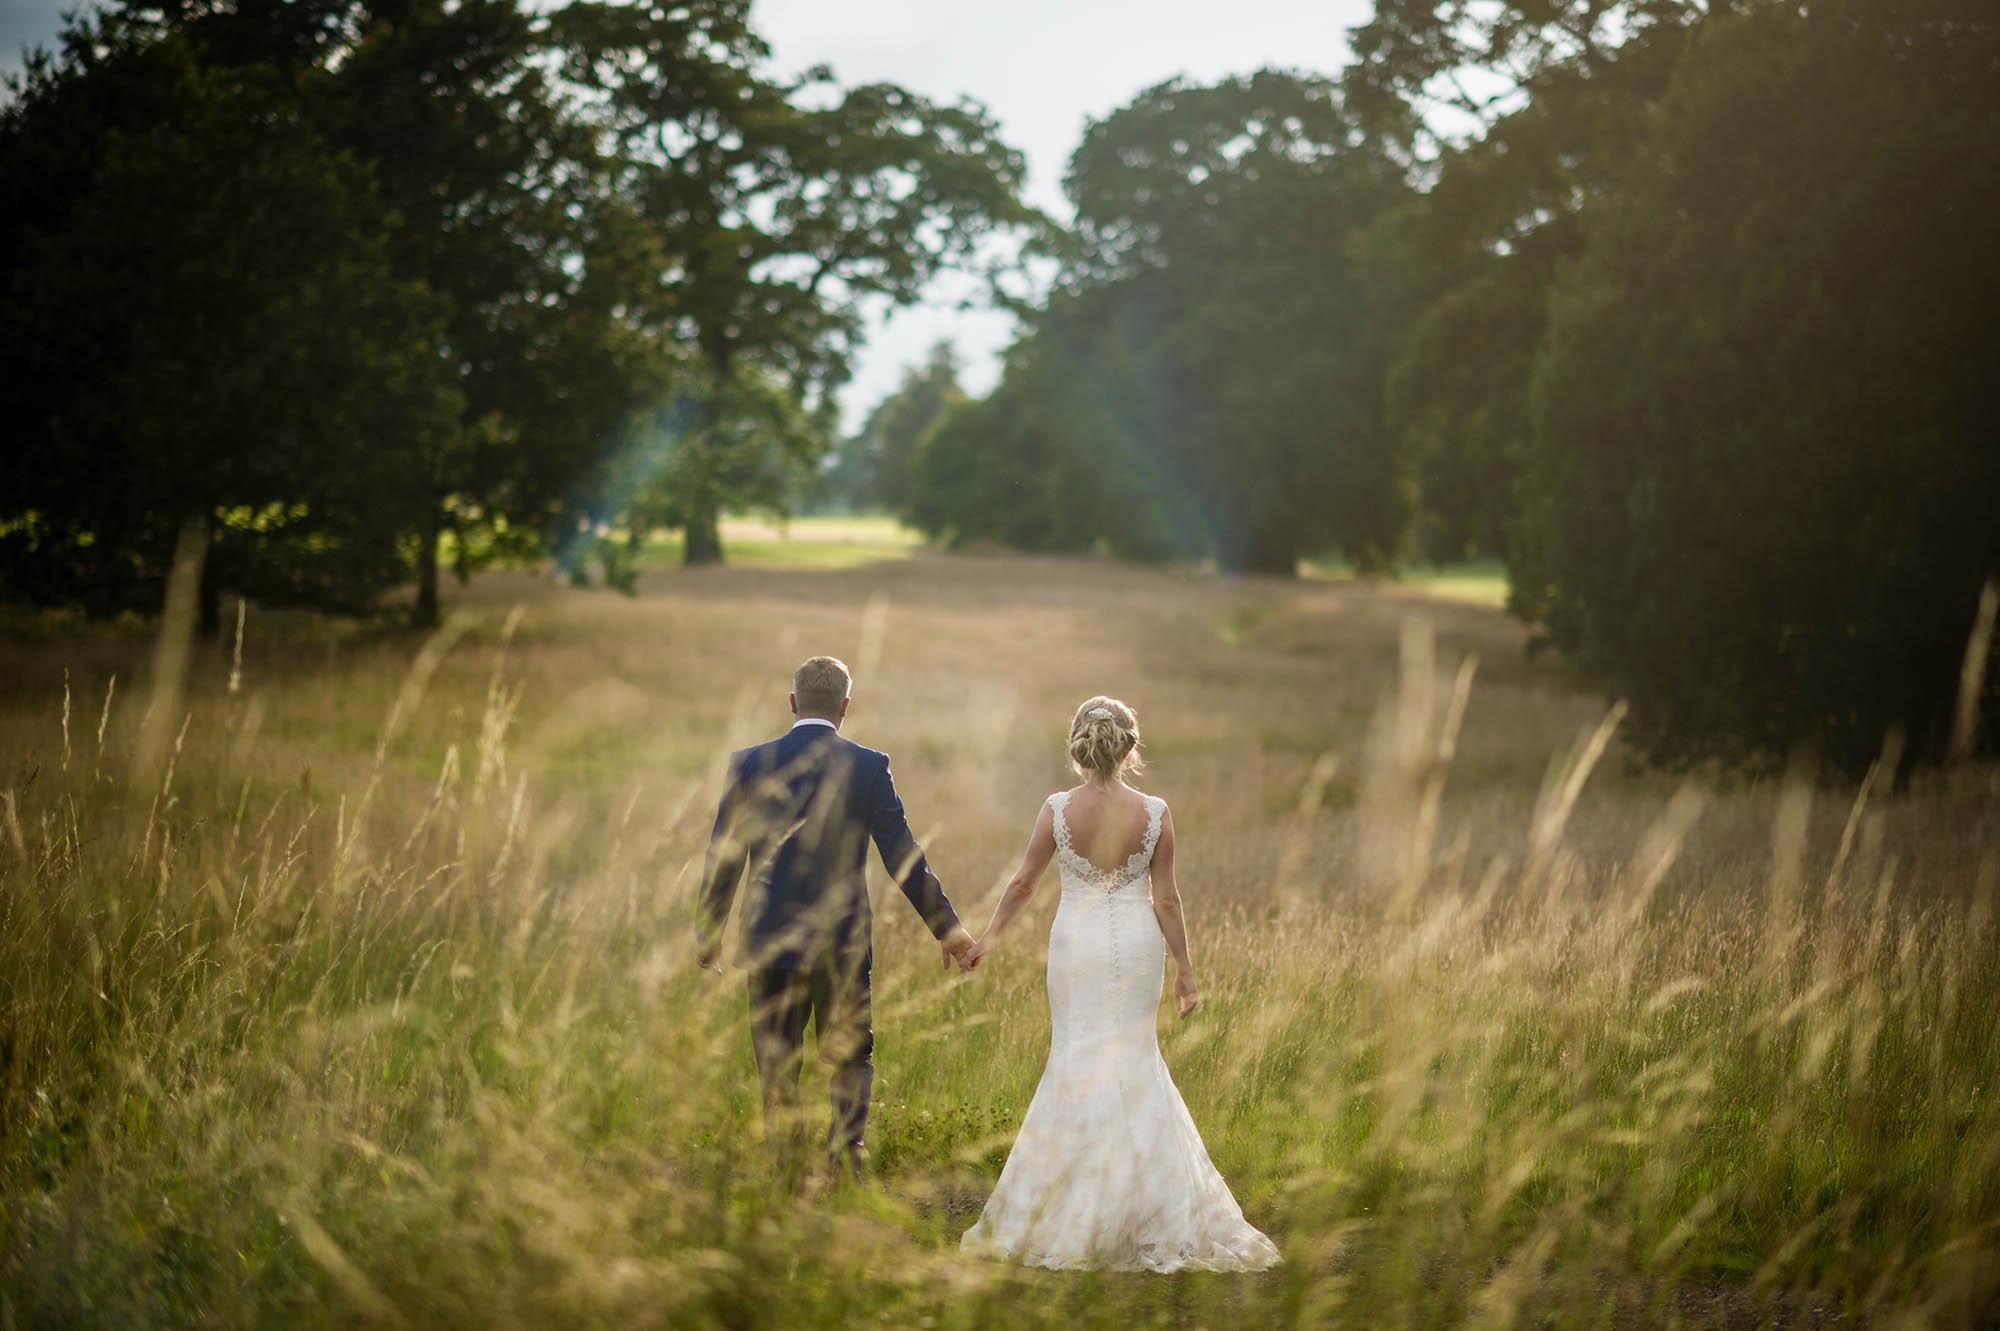 Rudding park wedding photographer.JPG